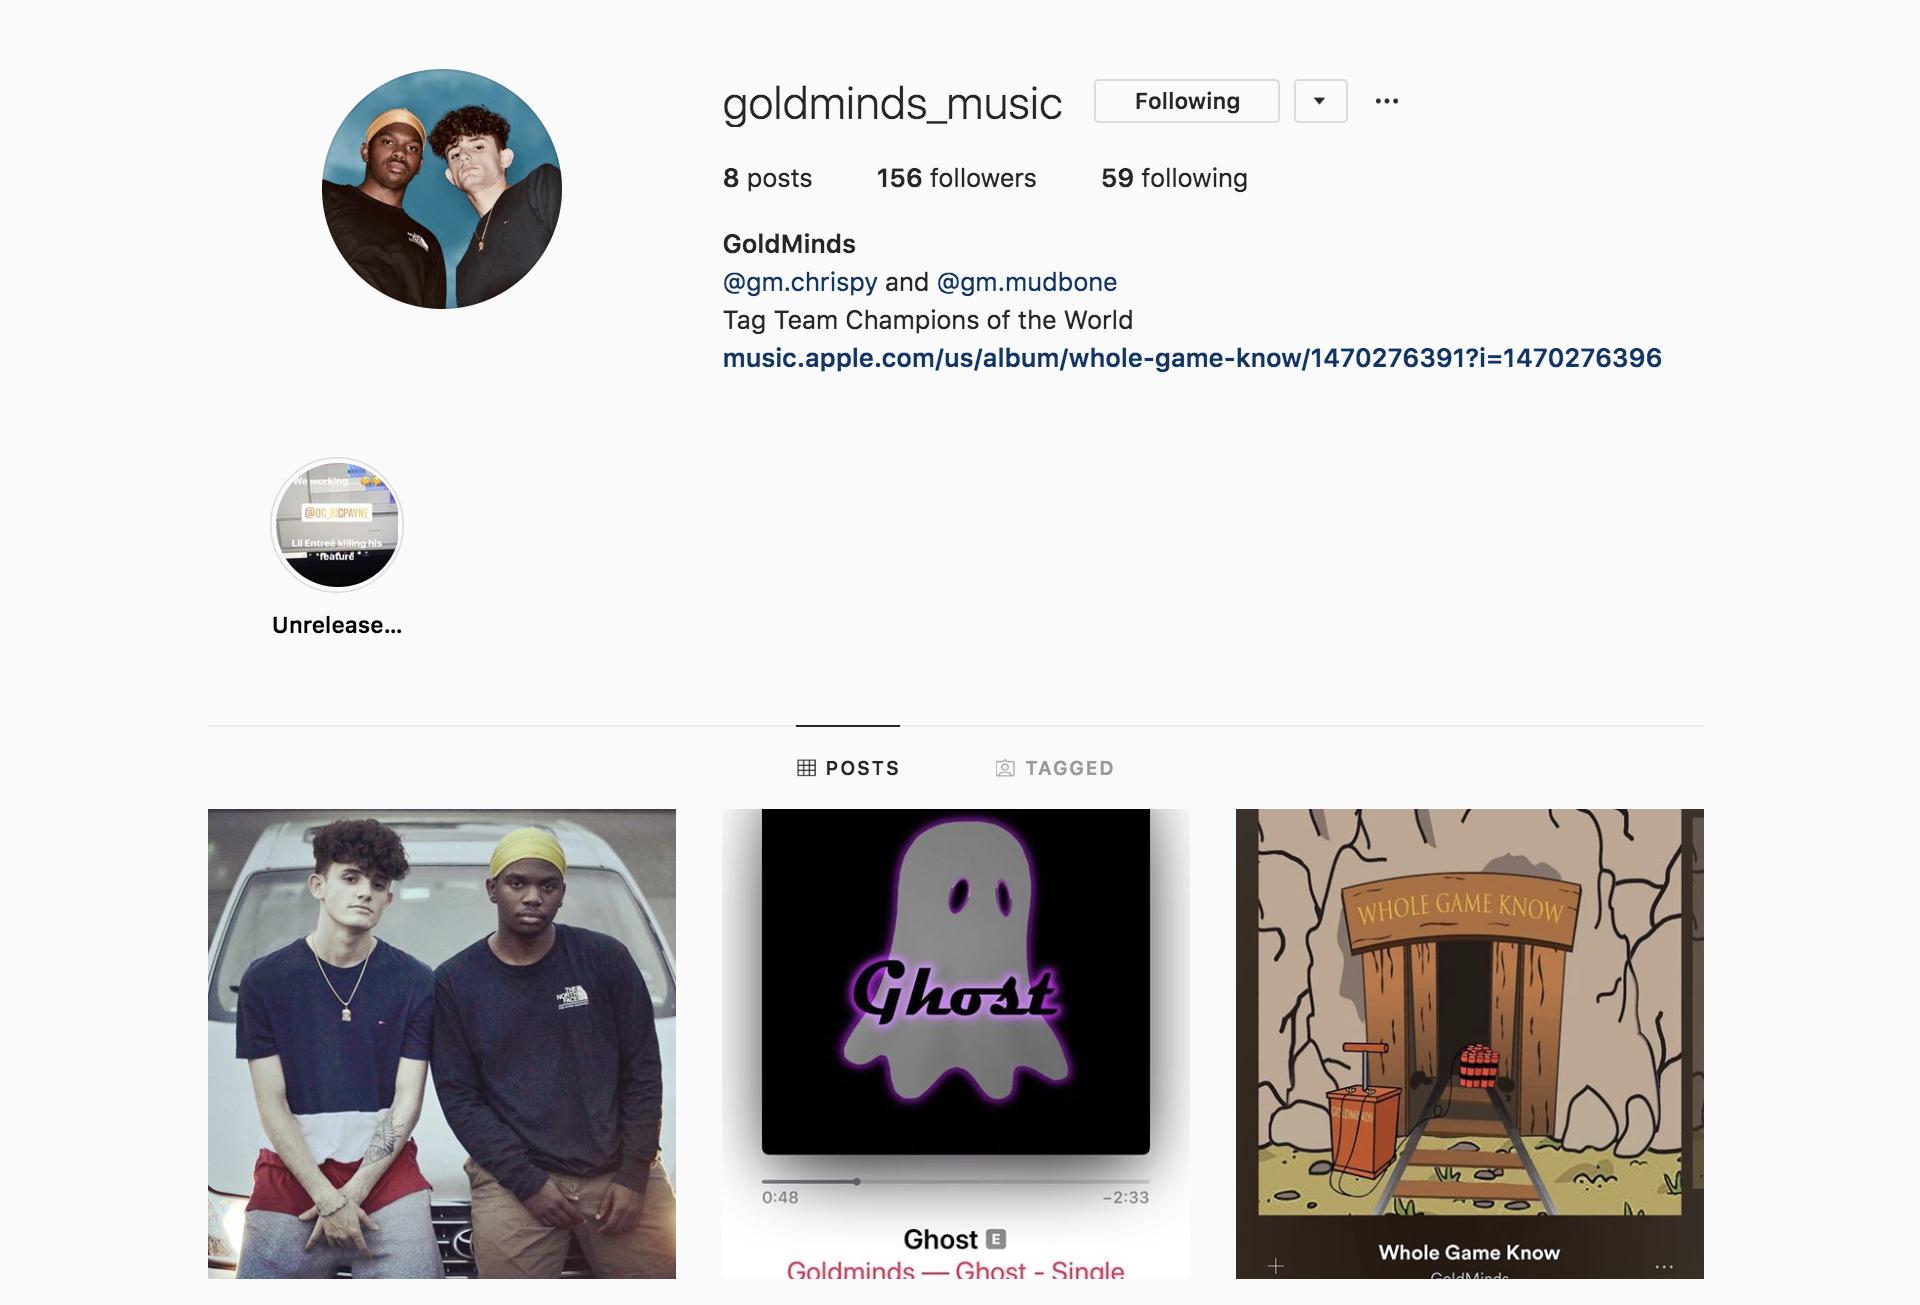 https://www.instagram.com/goldminds_music/